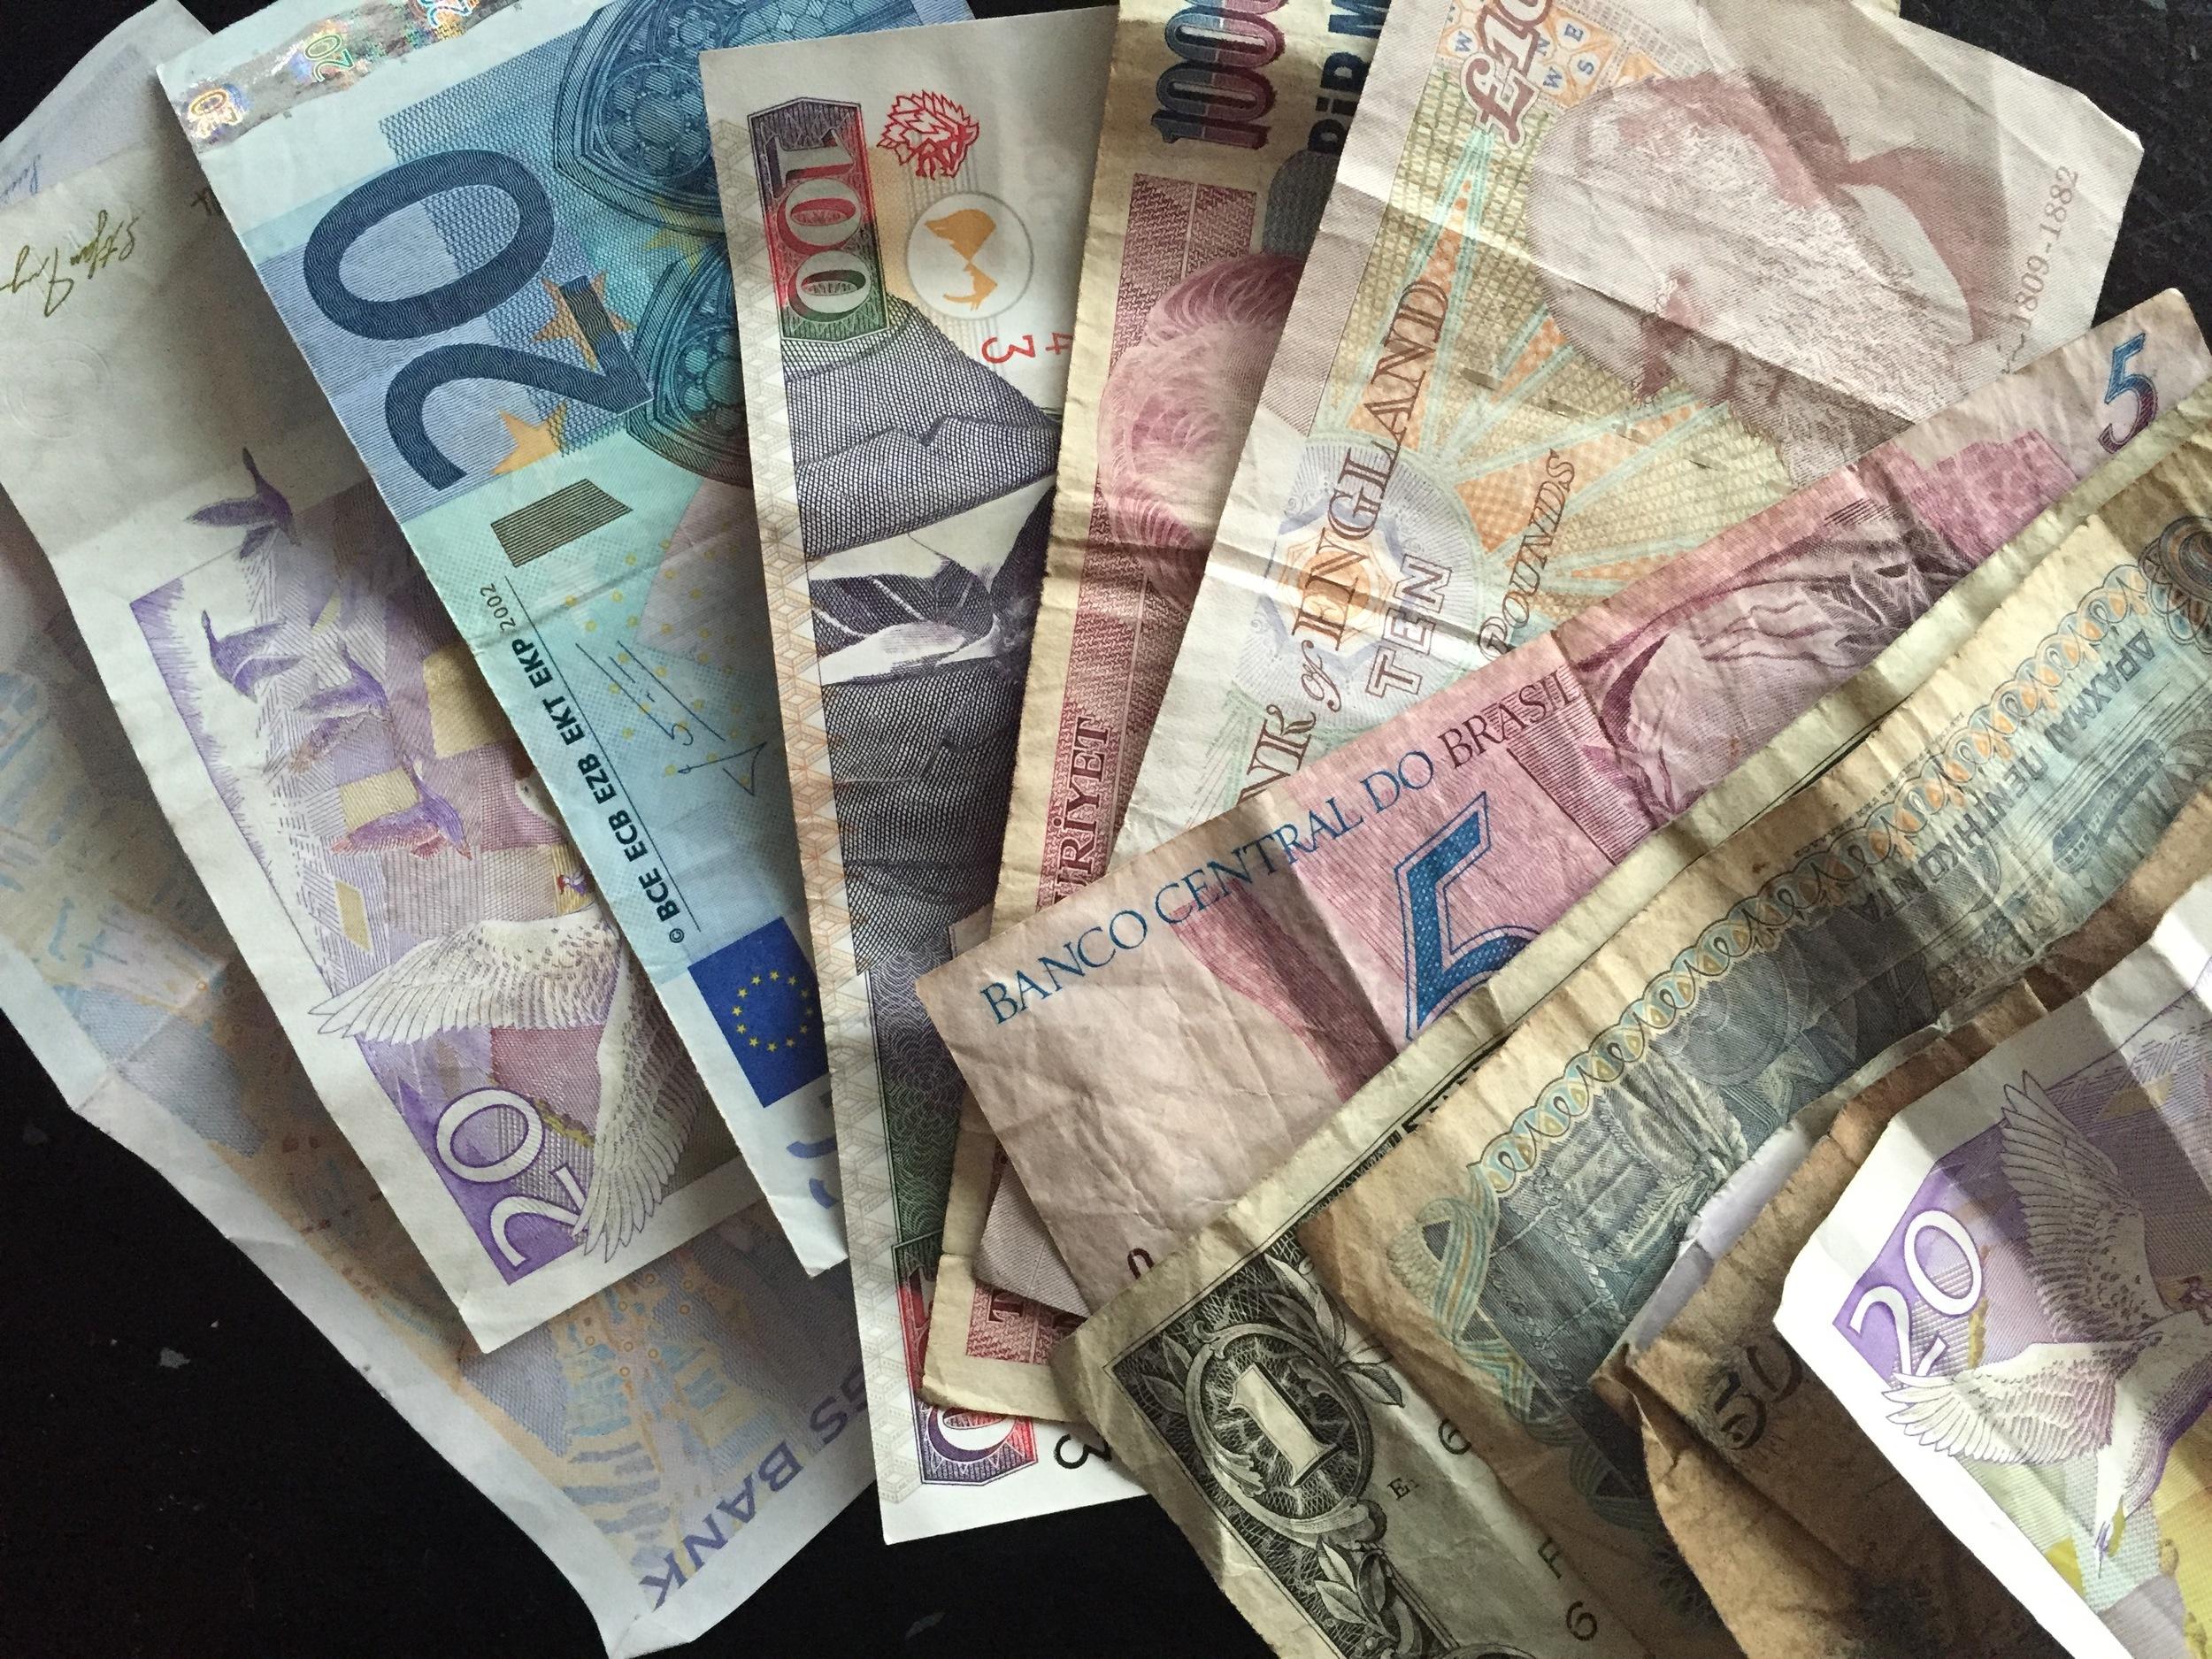 Kaster du bort penger? Her er de lure triksene.         Foto: Odd Roar Lange